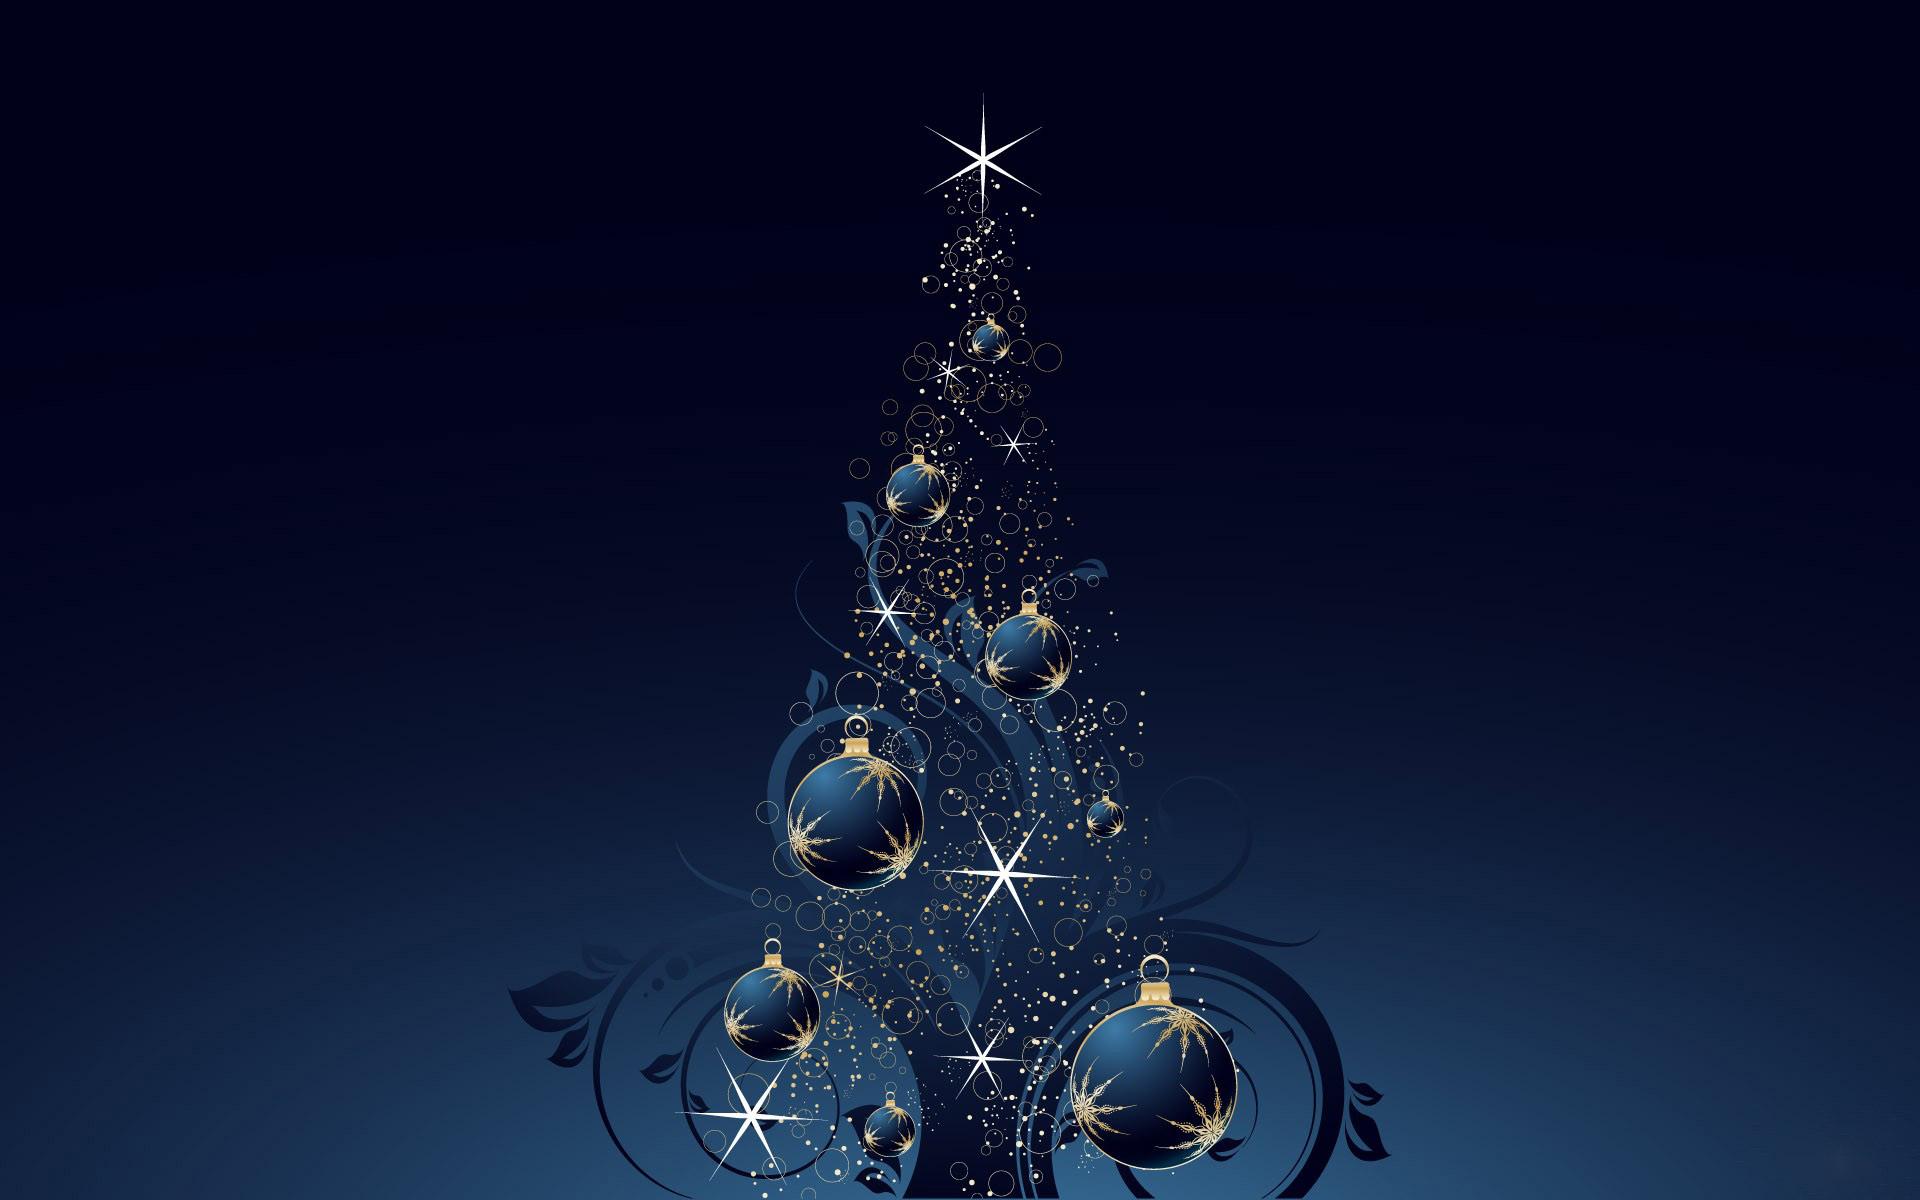 free christmas tree desktop wallpaper 2015   Grasscloth Wallpaper 1920x1200